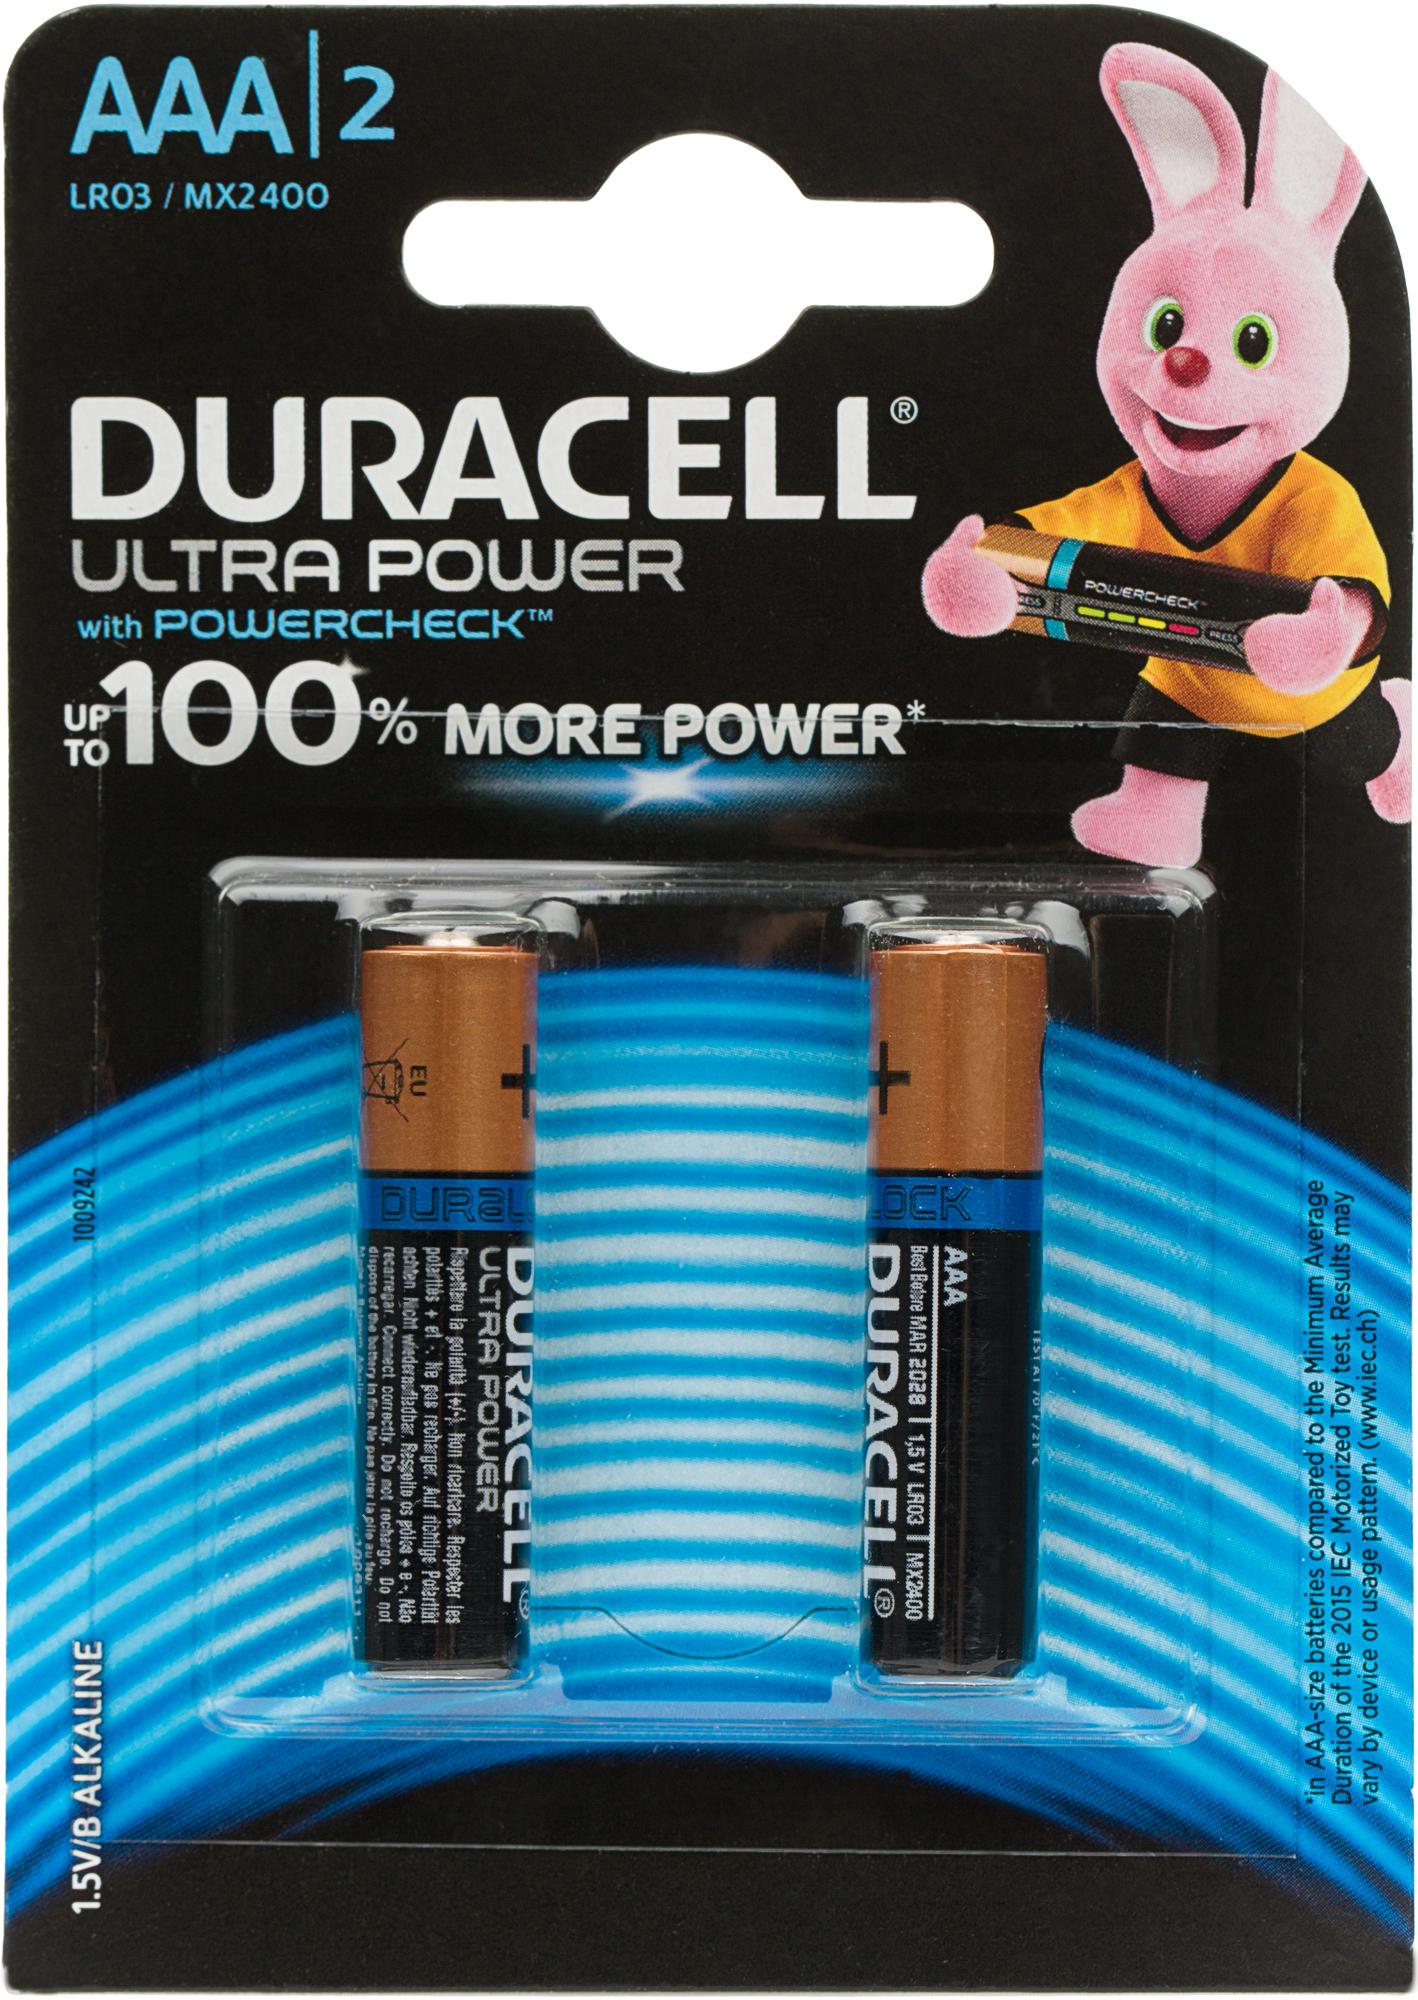 Duracell Батарейки щелочные Duracell Ultra Power ААА/LR03, 2 шт. цена